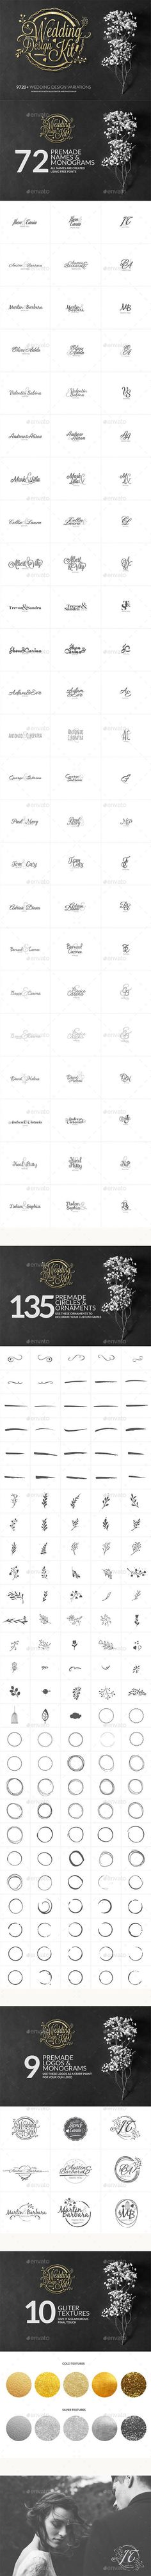 Wedding Design Logo Kit Template PSD, AI Illustrator. Download here…: